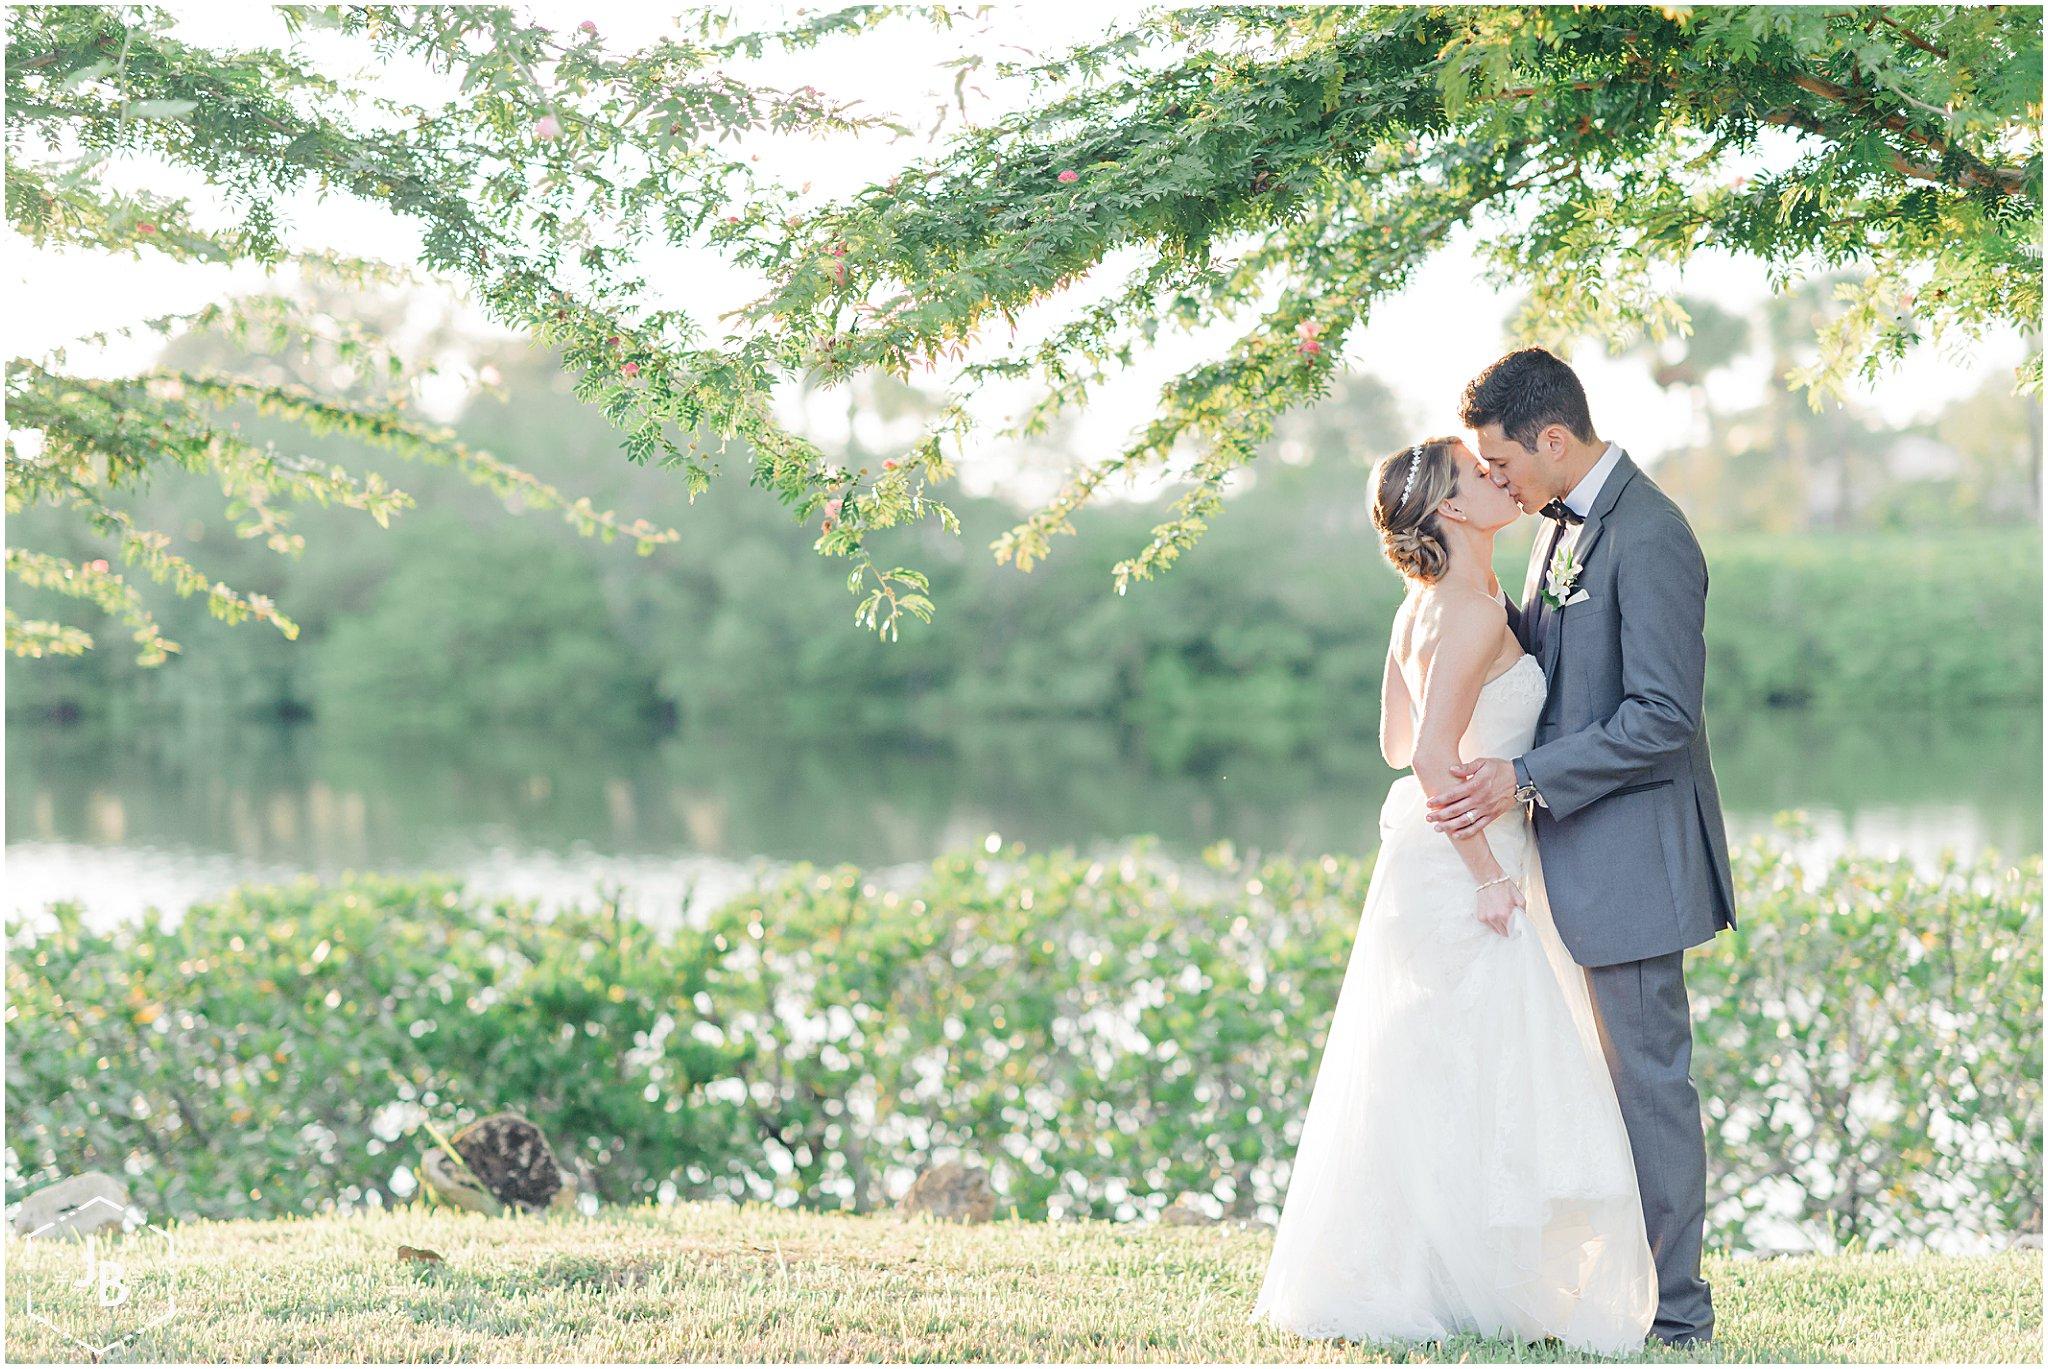 WeddingandEngagementFloridaPhotographer_0370.jpg